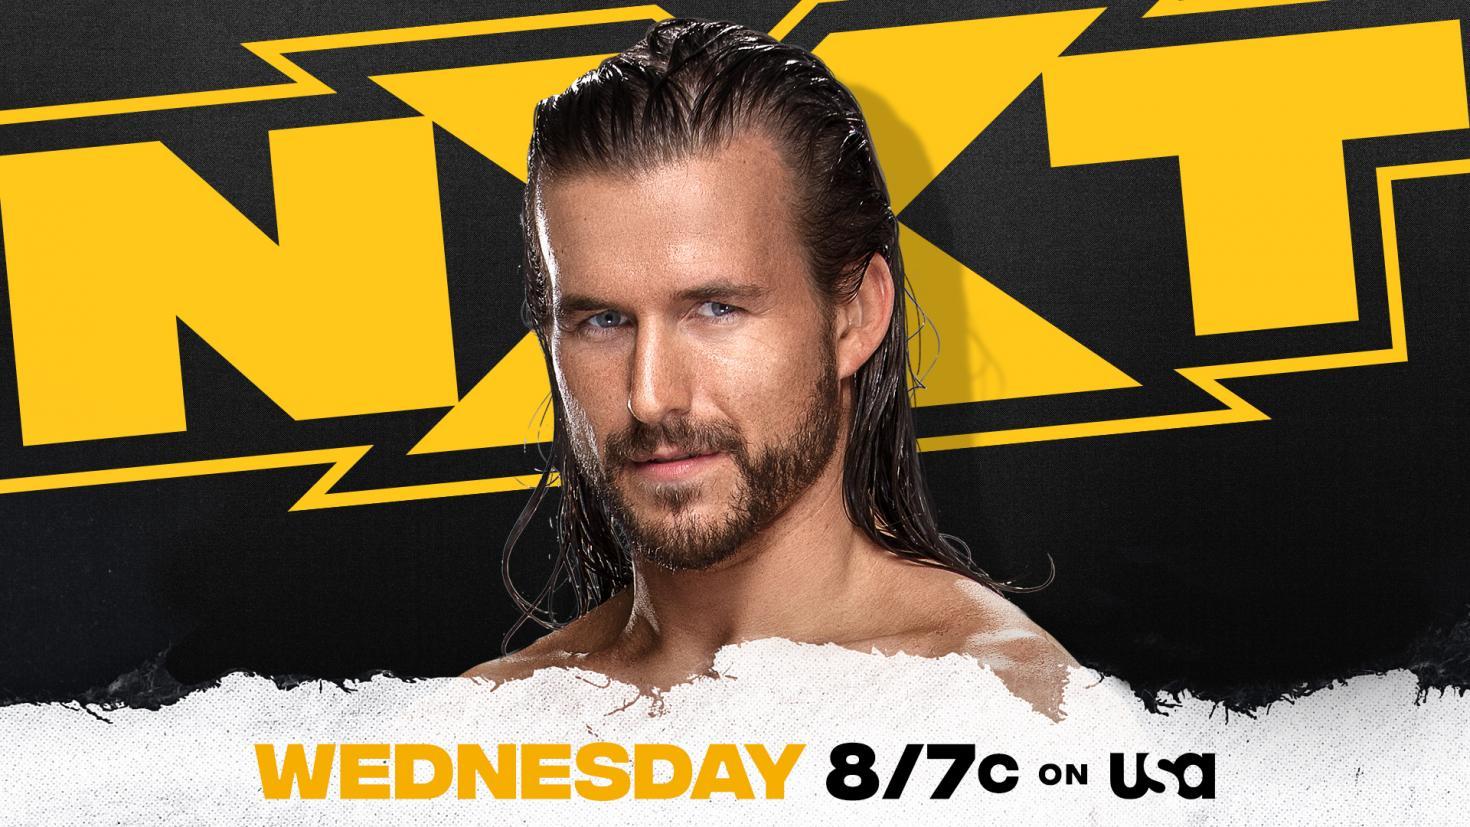 NXT Results – Feb. 24, 2021 – Kross vs. Escobar – TPWW